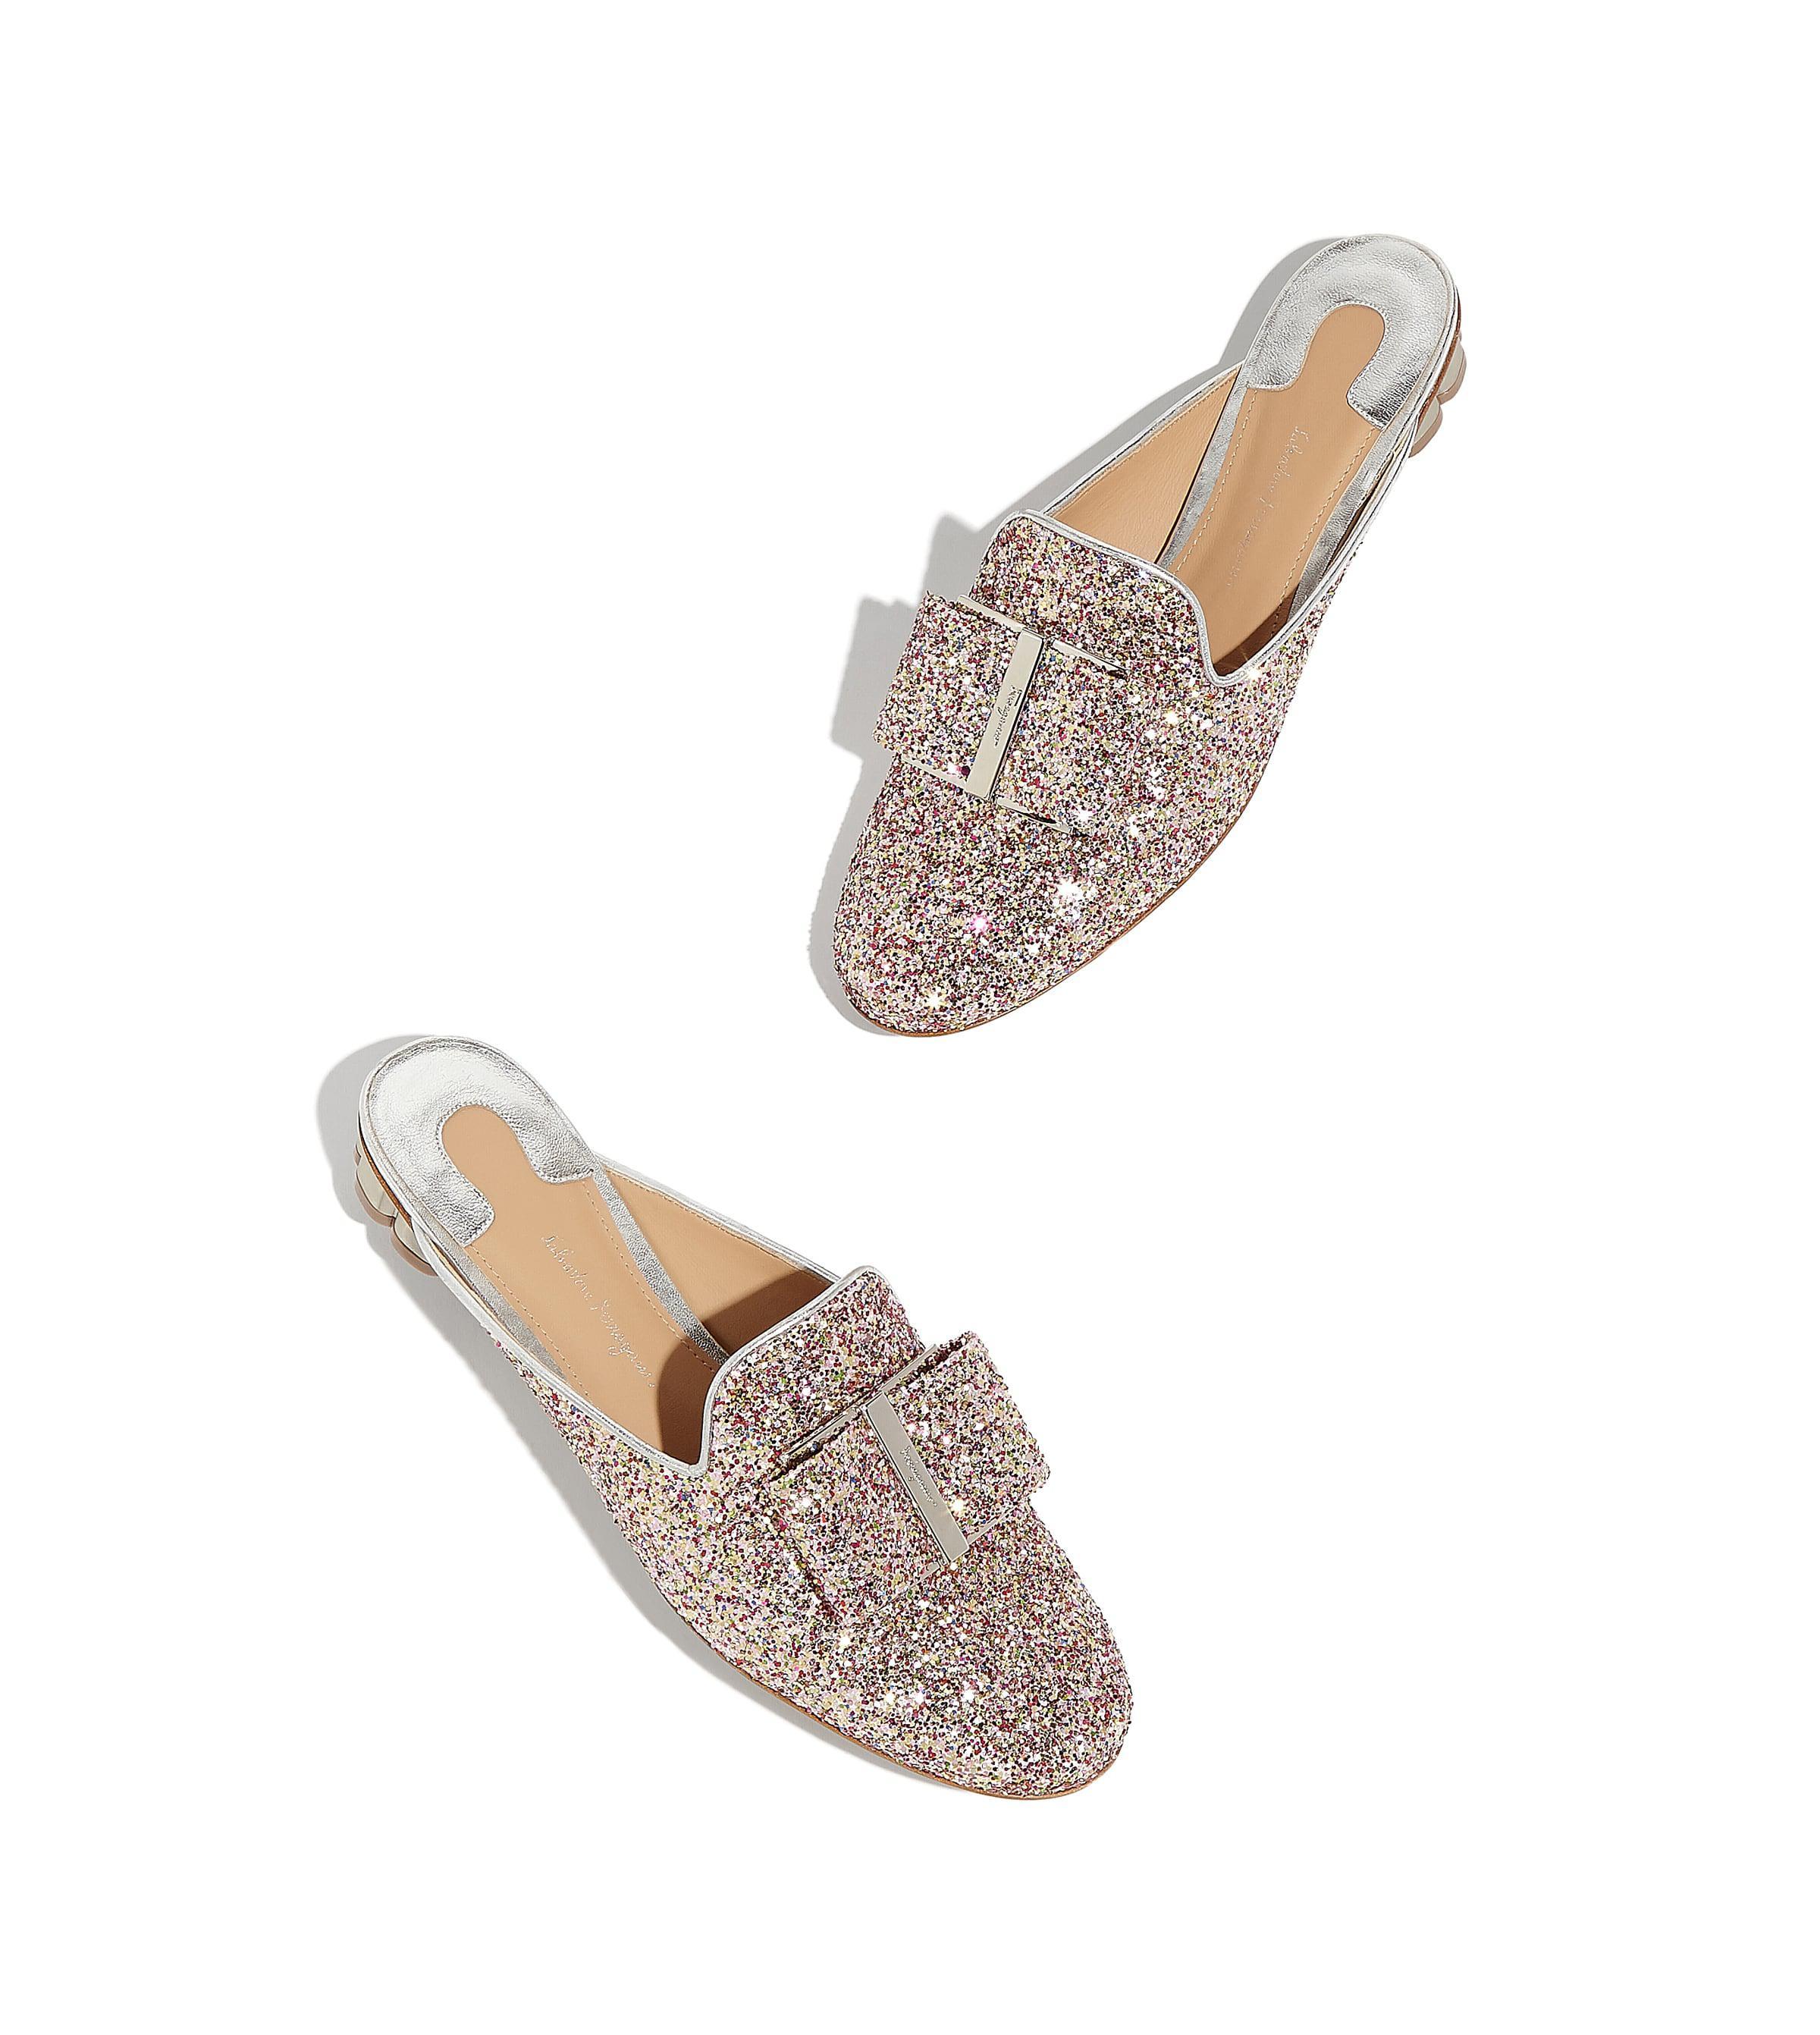 3c91c4c3e02ab7 Lyst - Ferragamo Glitter Flower Heel Mule Slipper Shoe